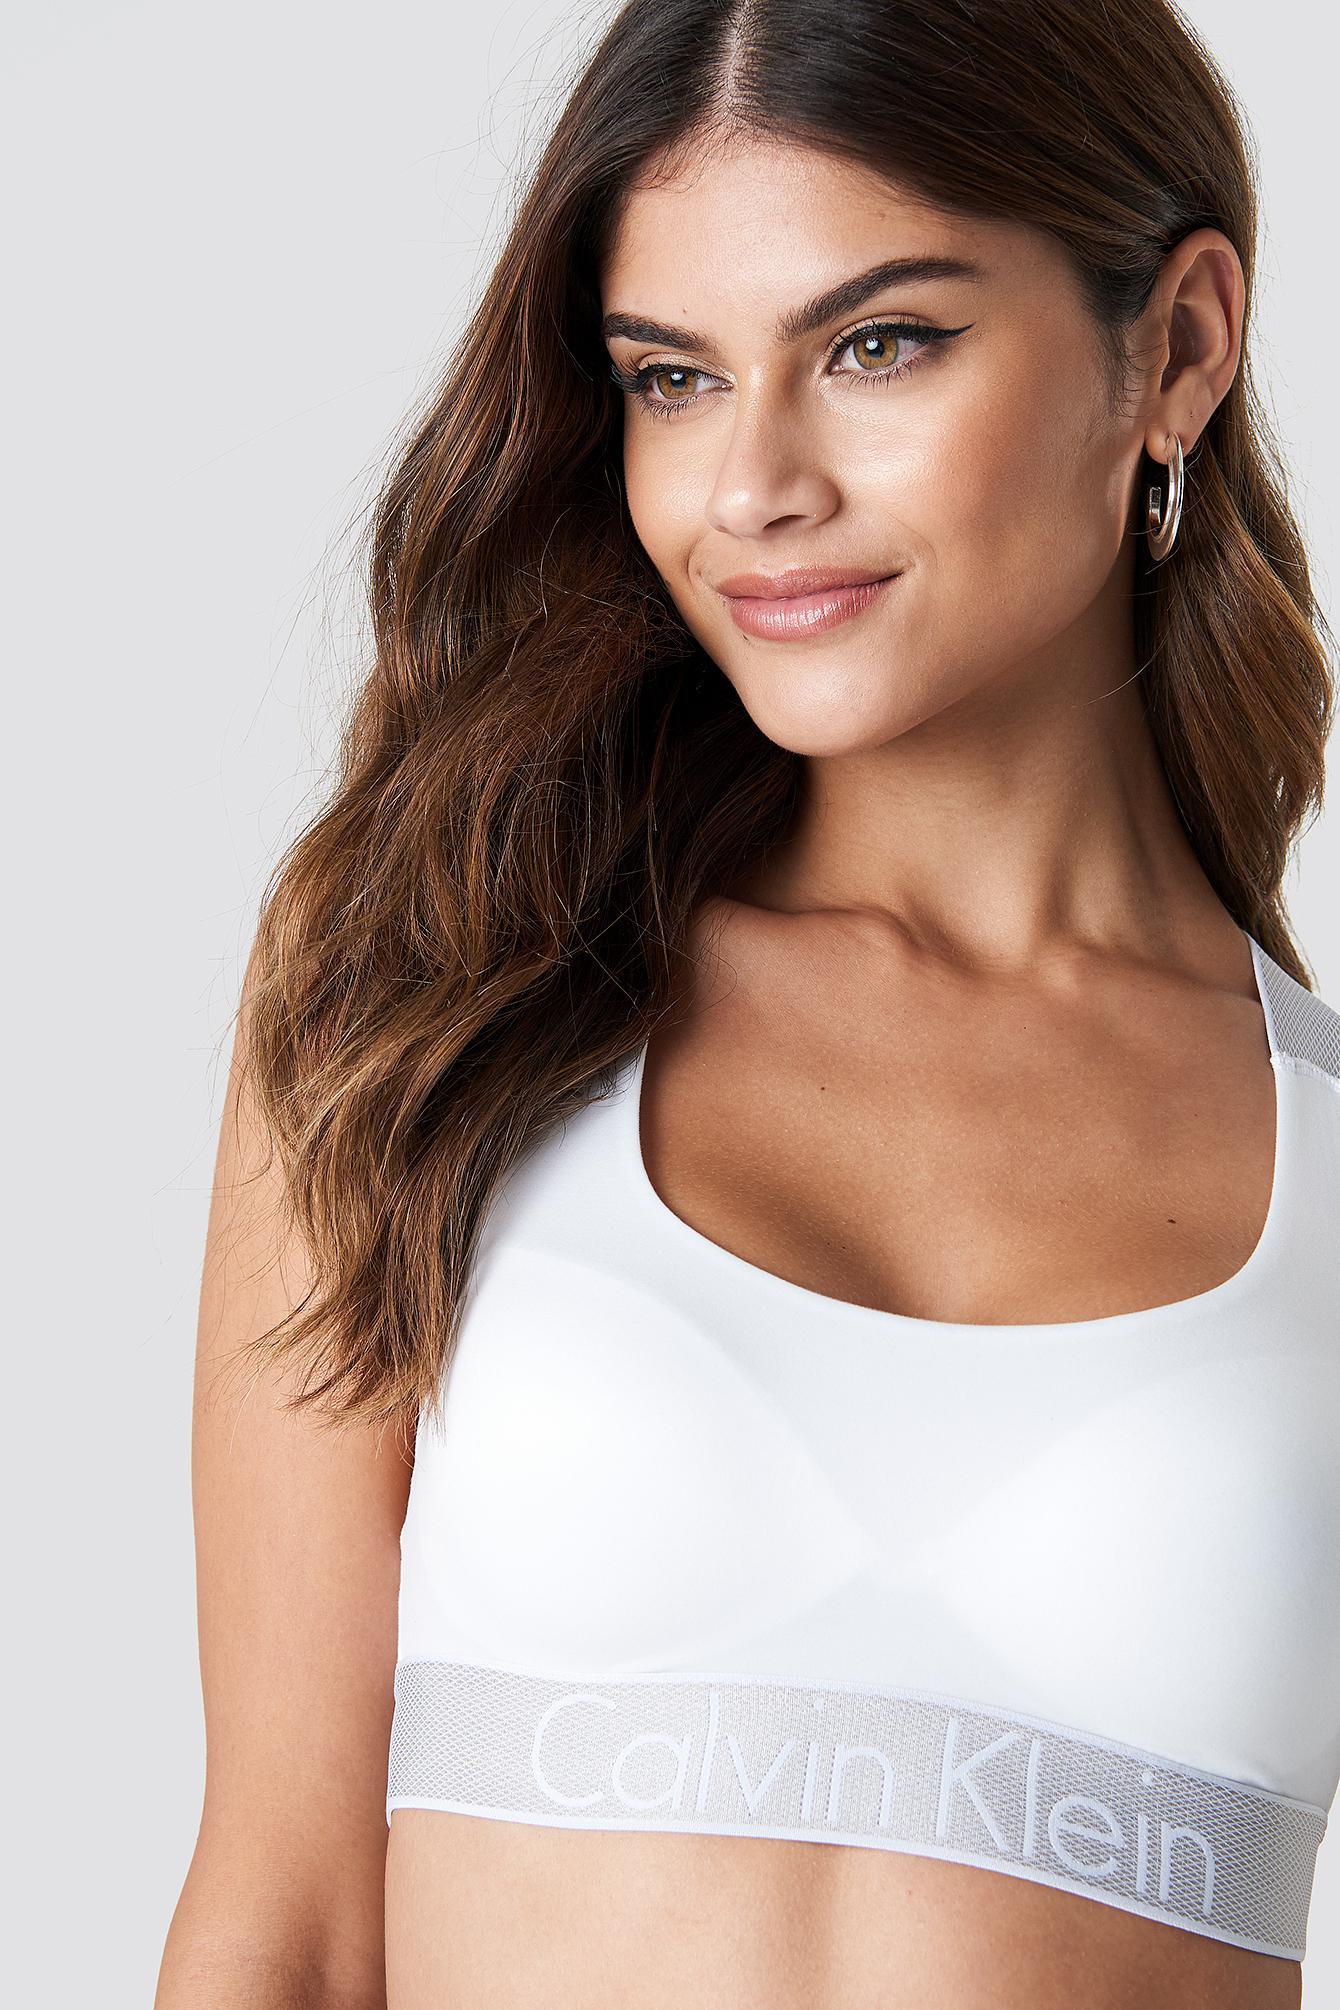 d7351dfc2ed Lyst - Calvin Klein Customized Stretch Bralette White in White